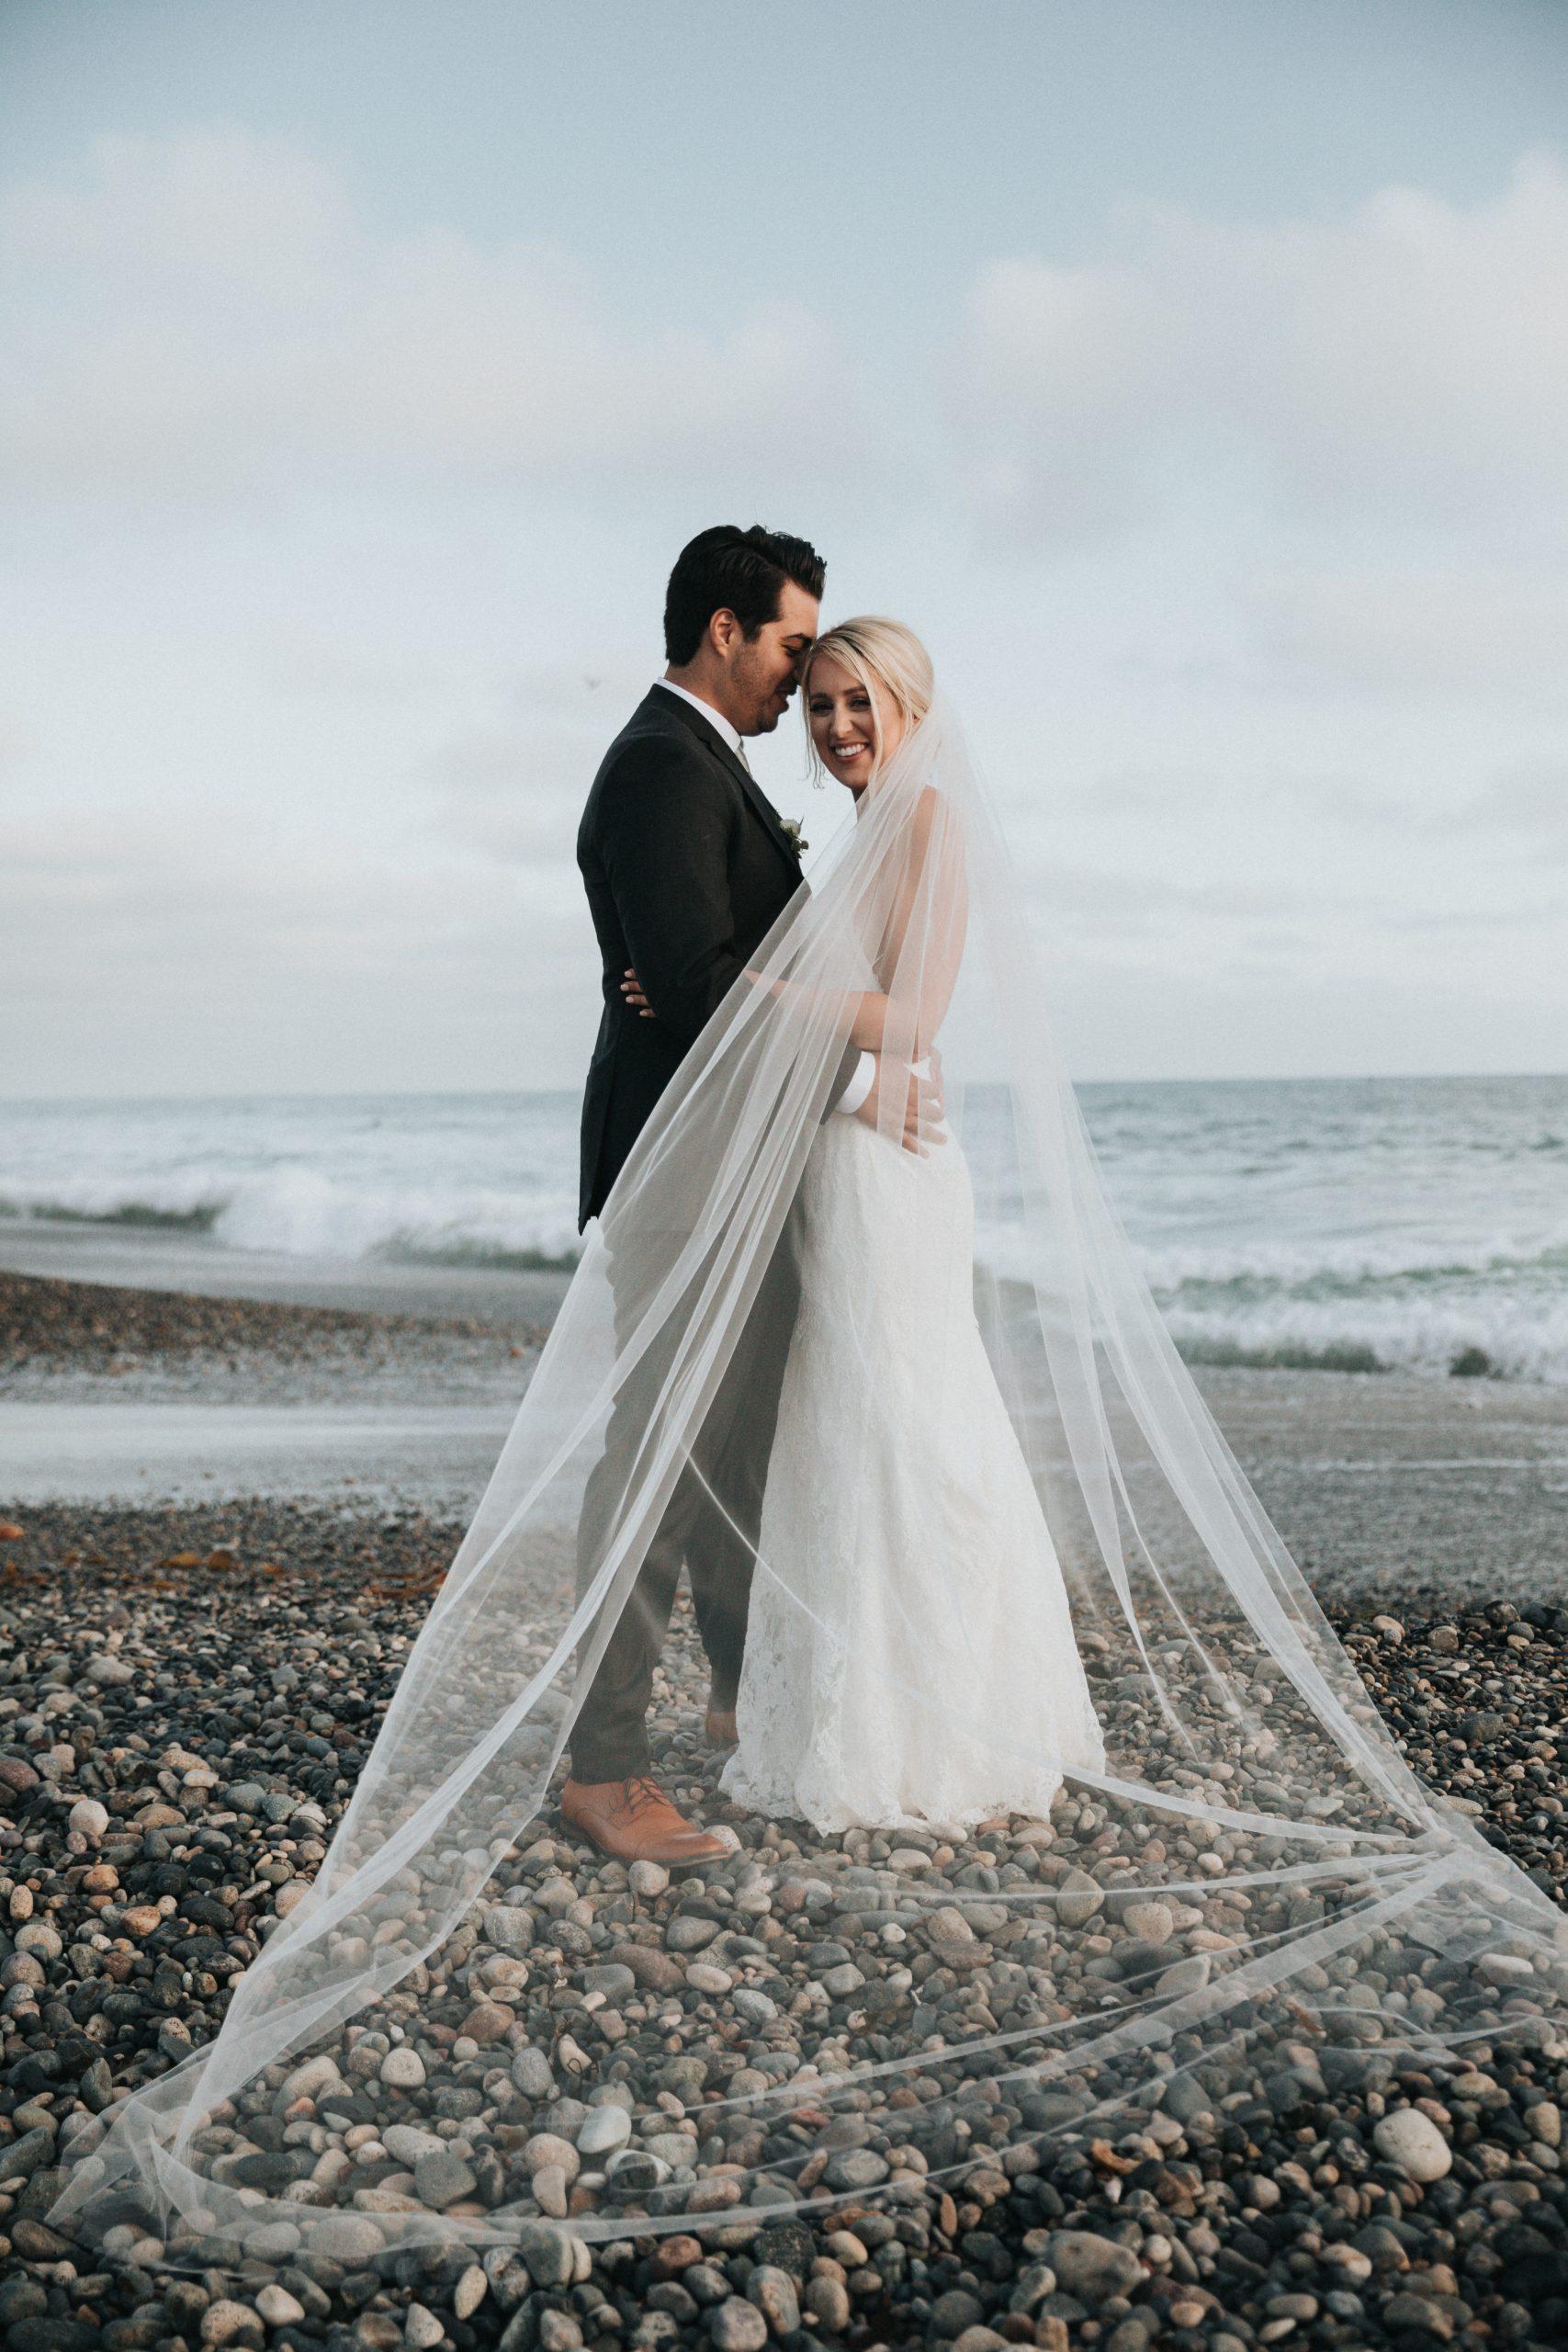 bride and groom on a pebble beach